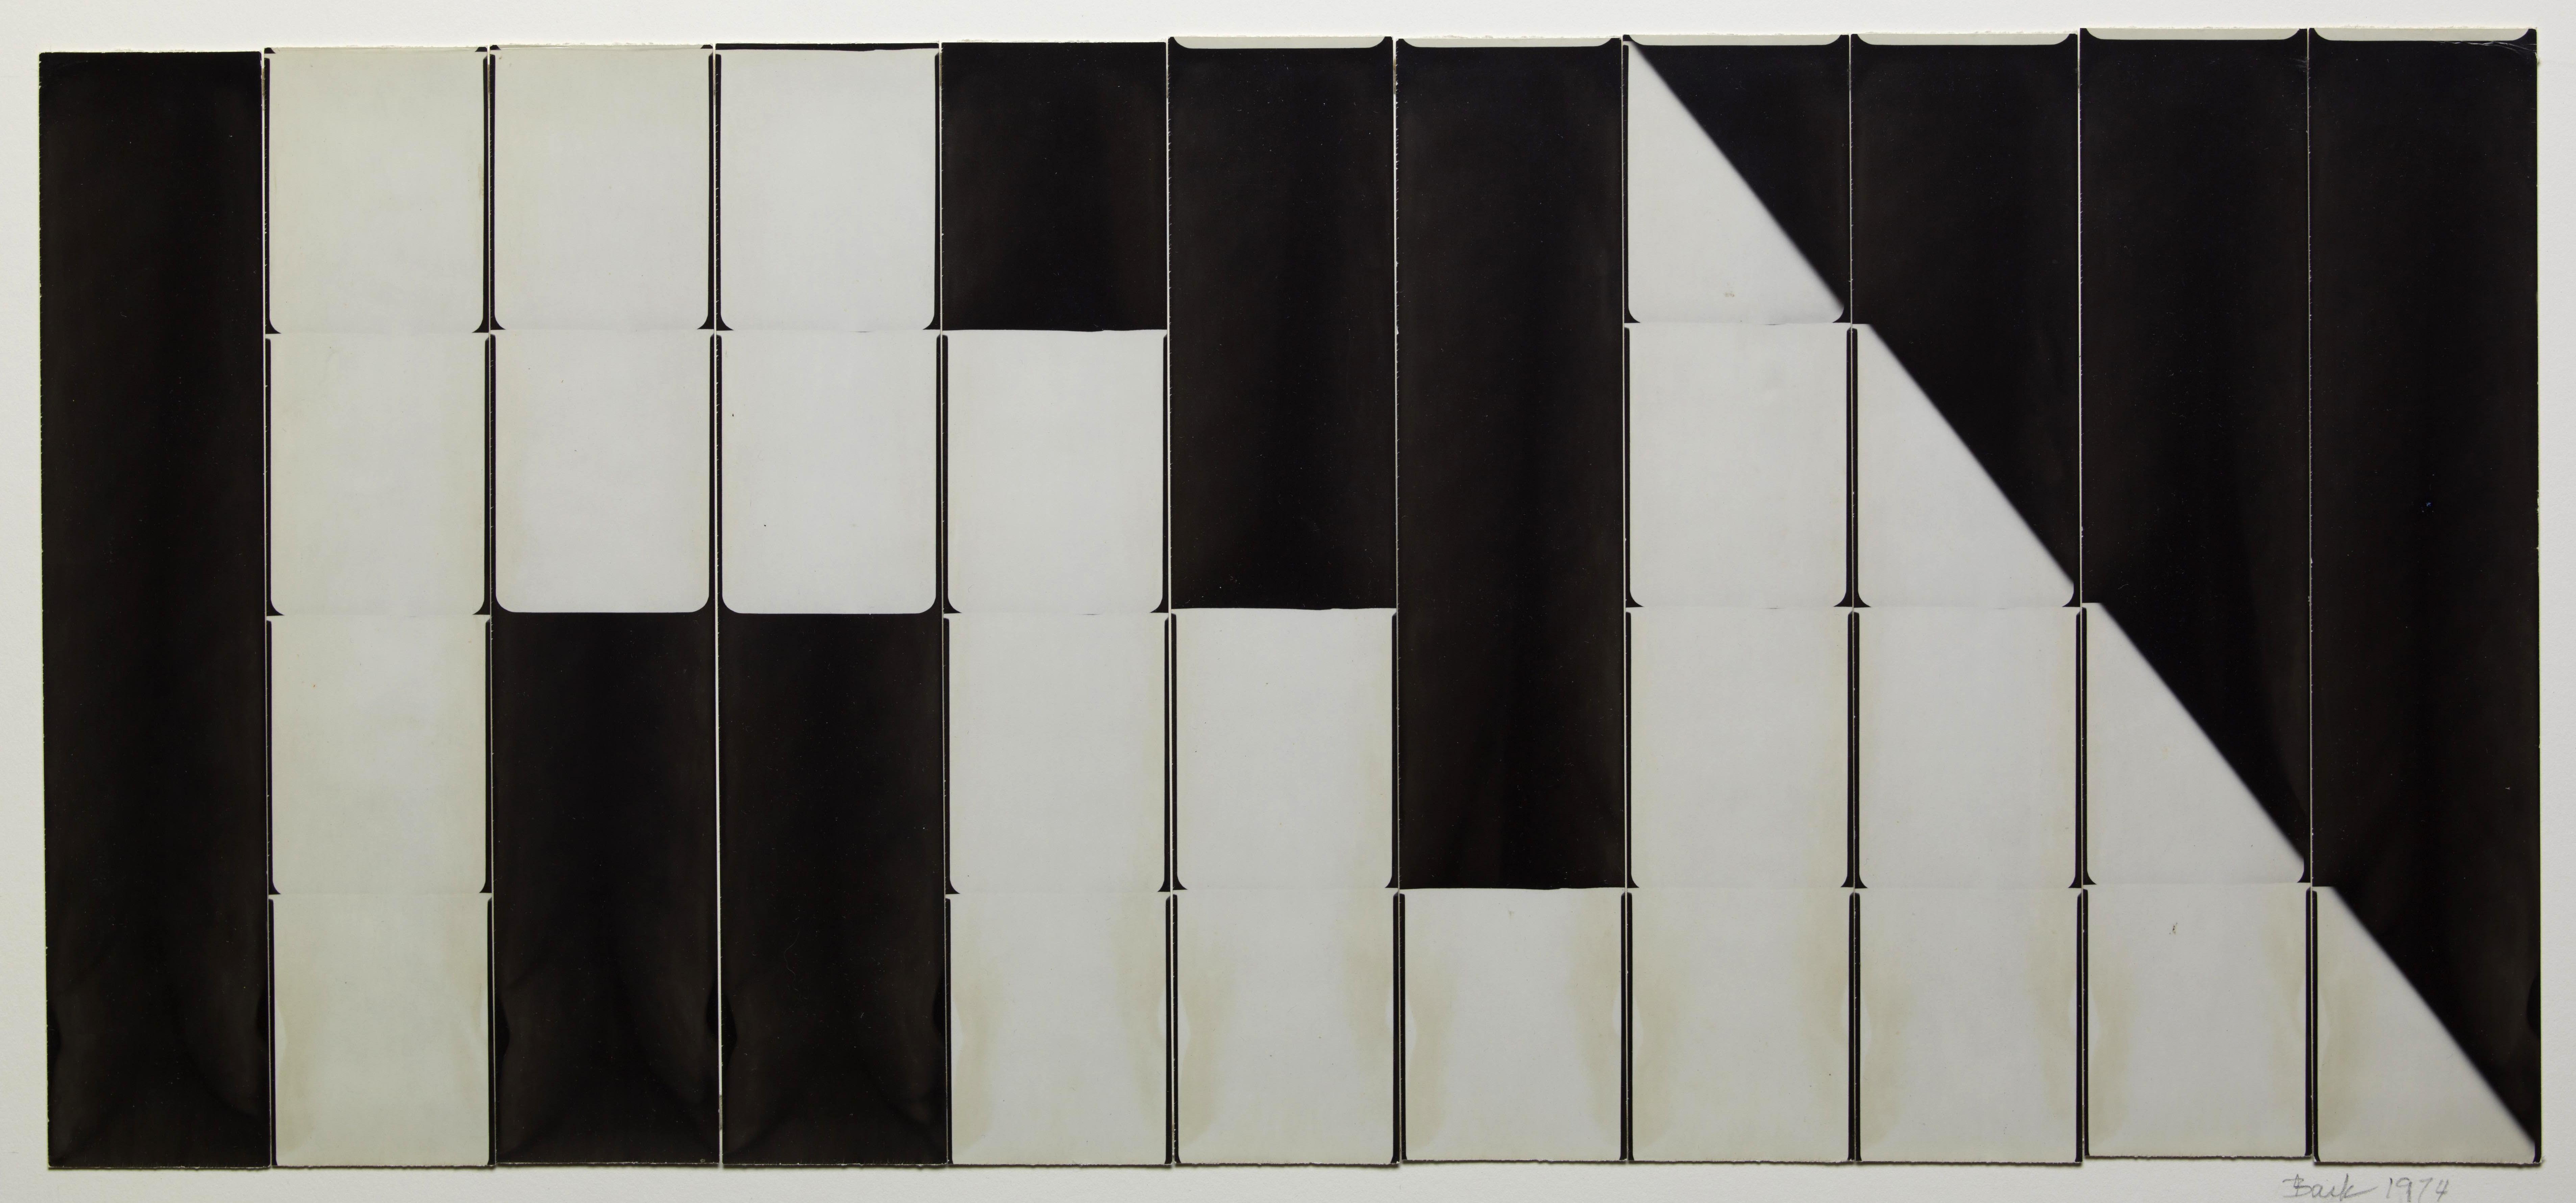 jared bark photomaton 06 la boite verte. Black Bedroom Furniture Sets. Home Design Ideas